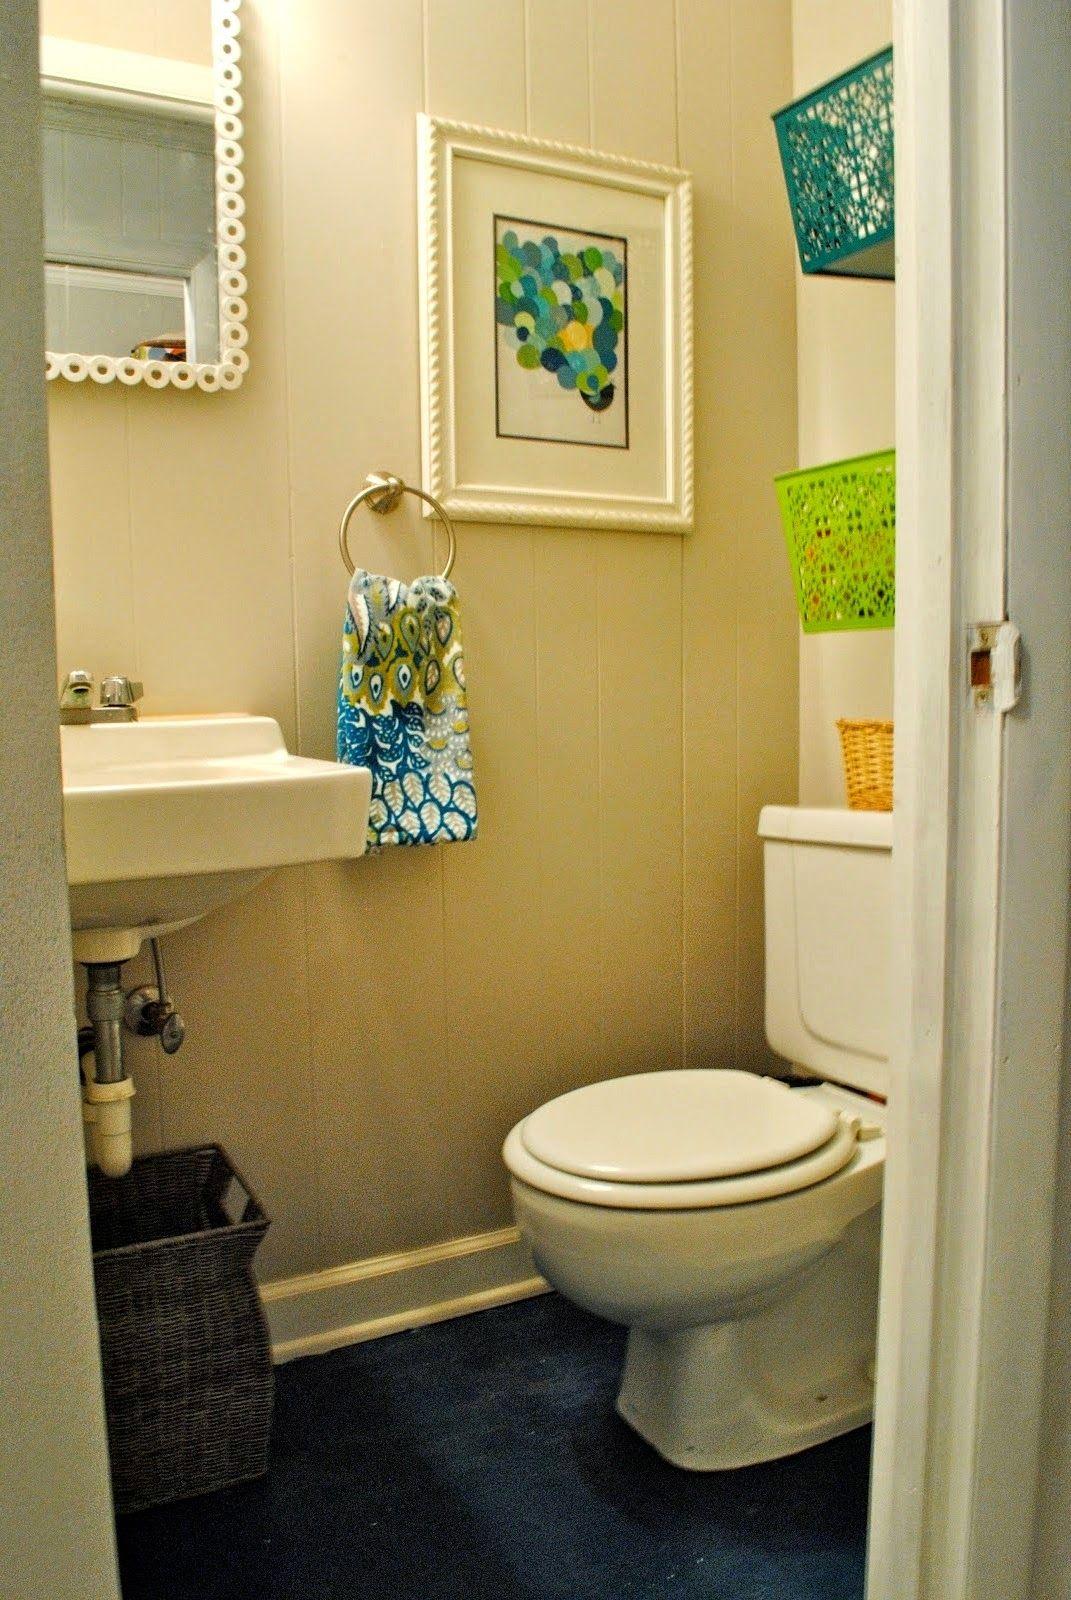 Bedroom : Cozy Bedroom Design Tumblr Travertine Wall Decor Lamps ...